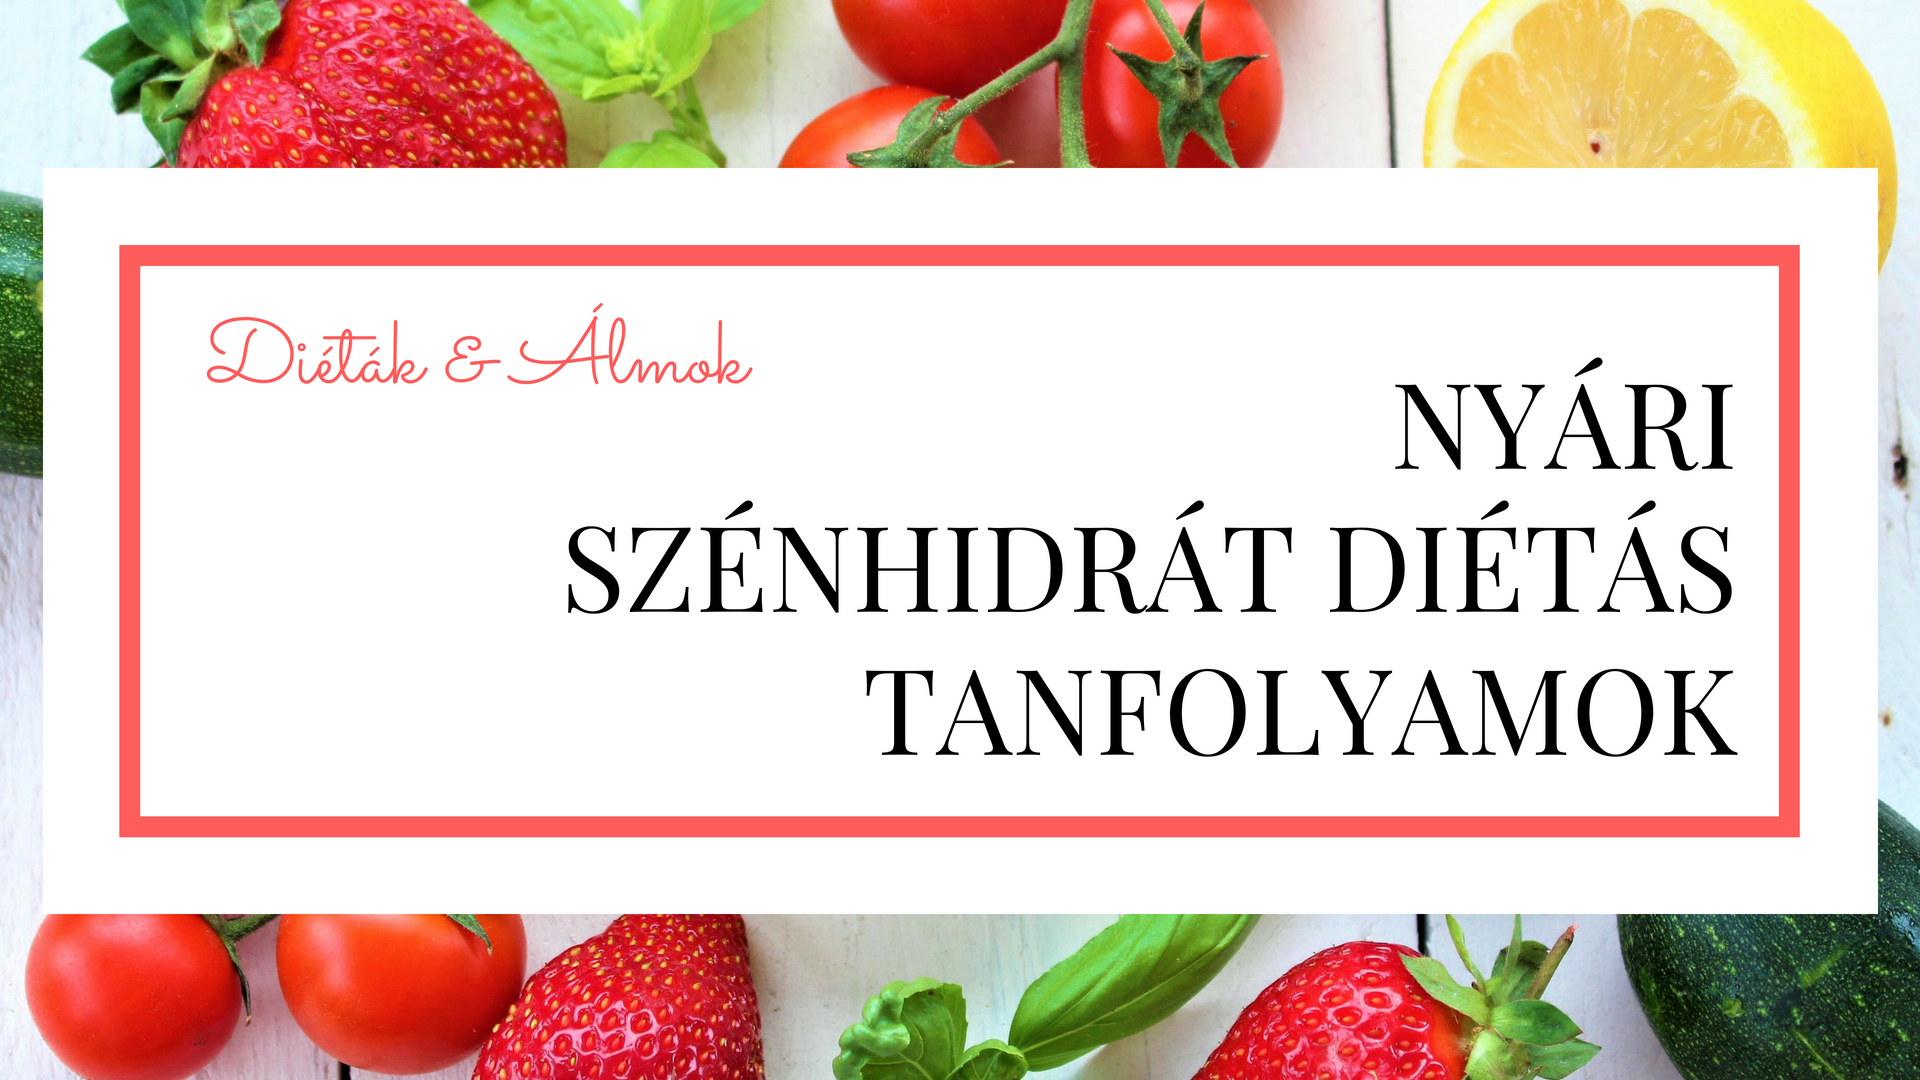 dietak_almok_szenhidrat_dietas_nyari_tanfolyamok_2018_blog.jpg